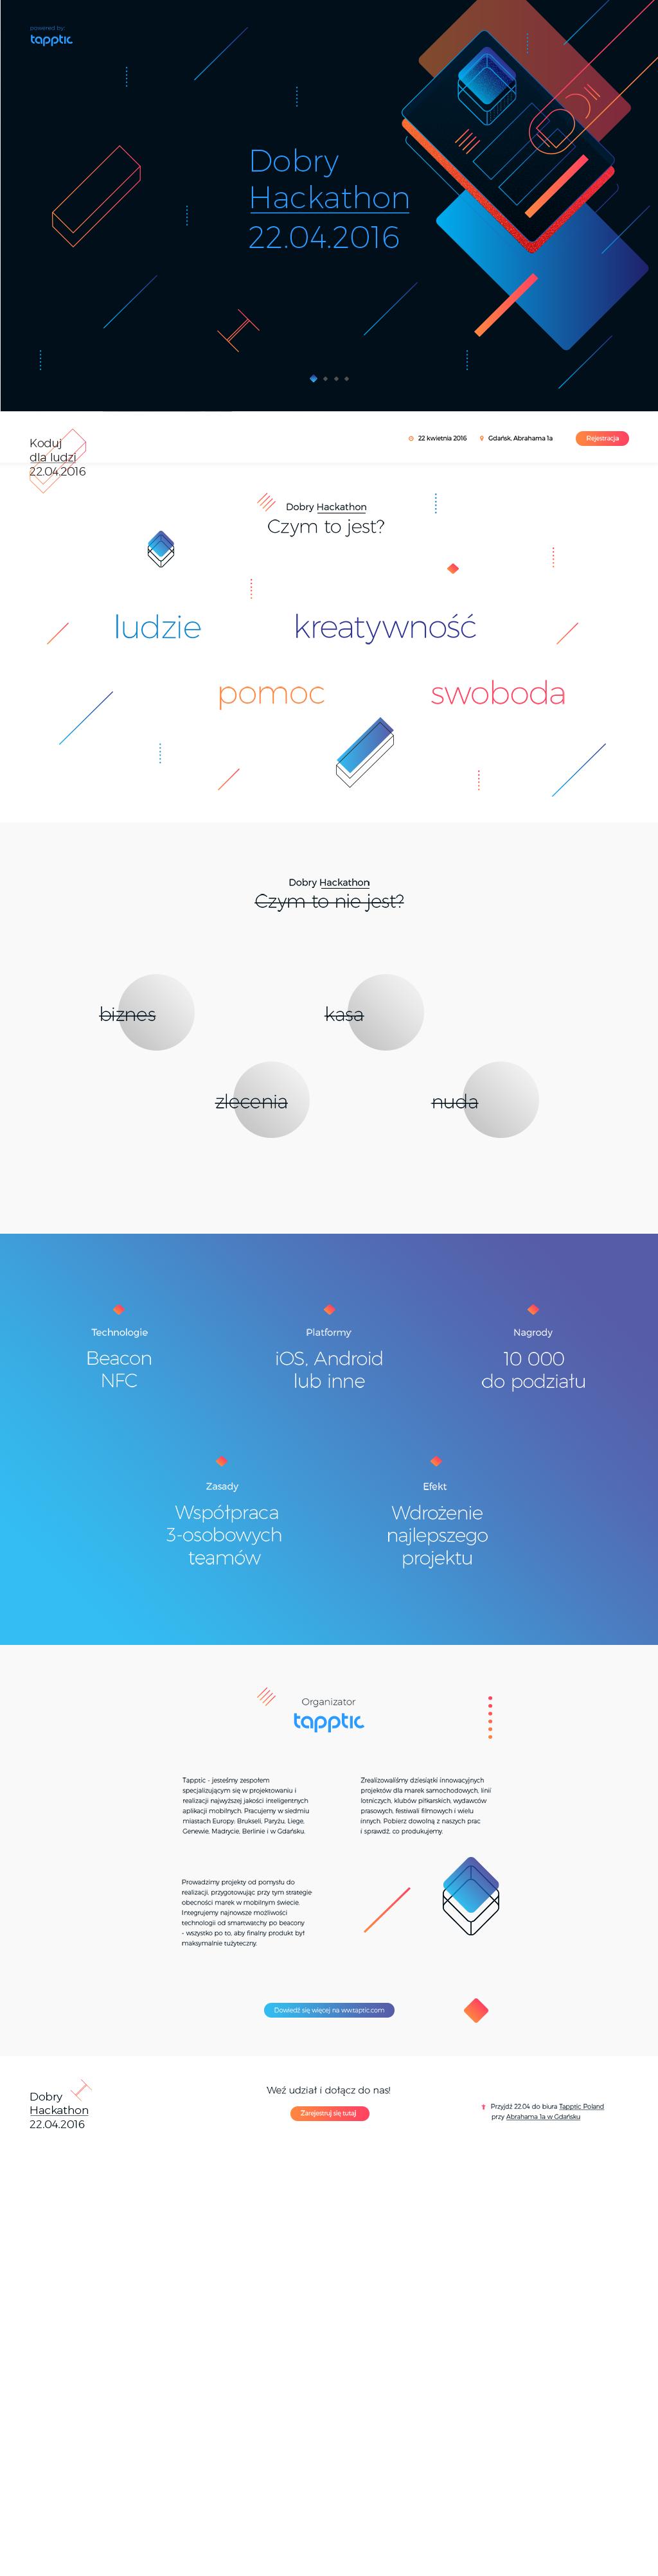 hackathon website preview